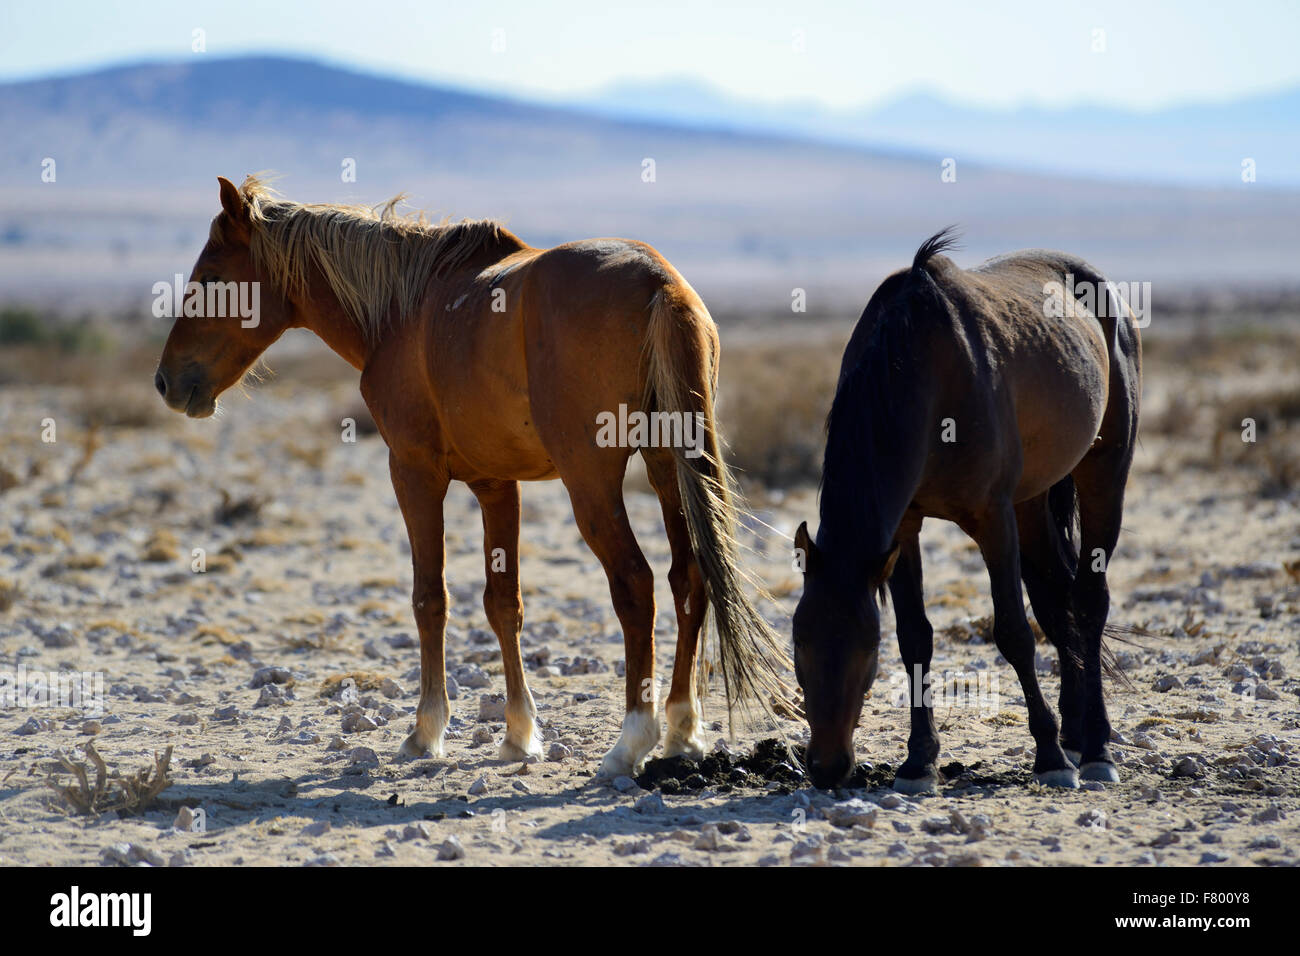 Wild desert horses at Garub near Aus, Namibia - Stock Image